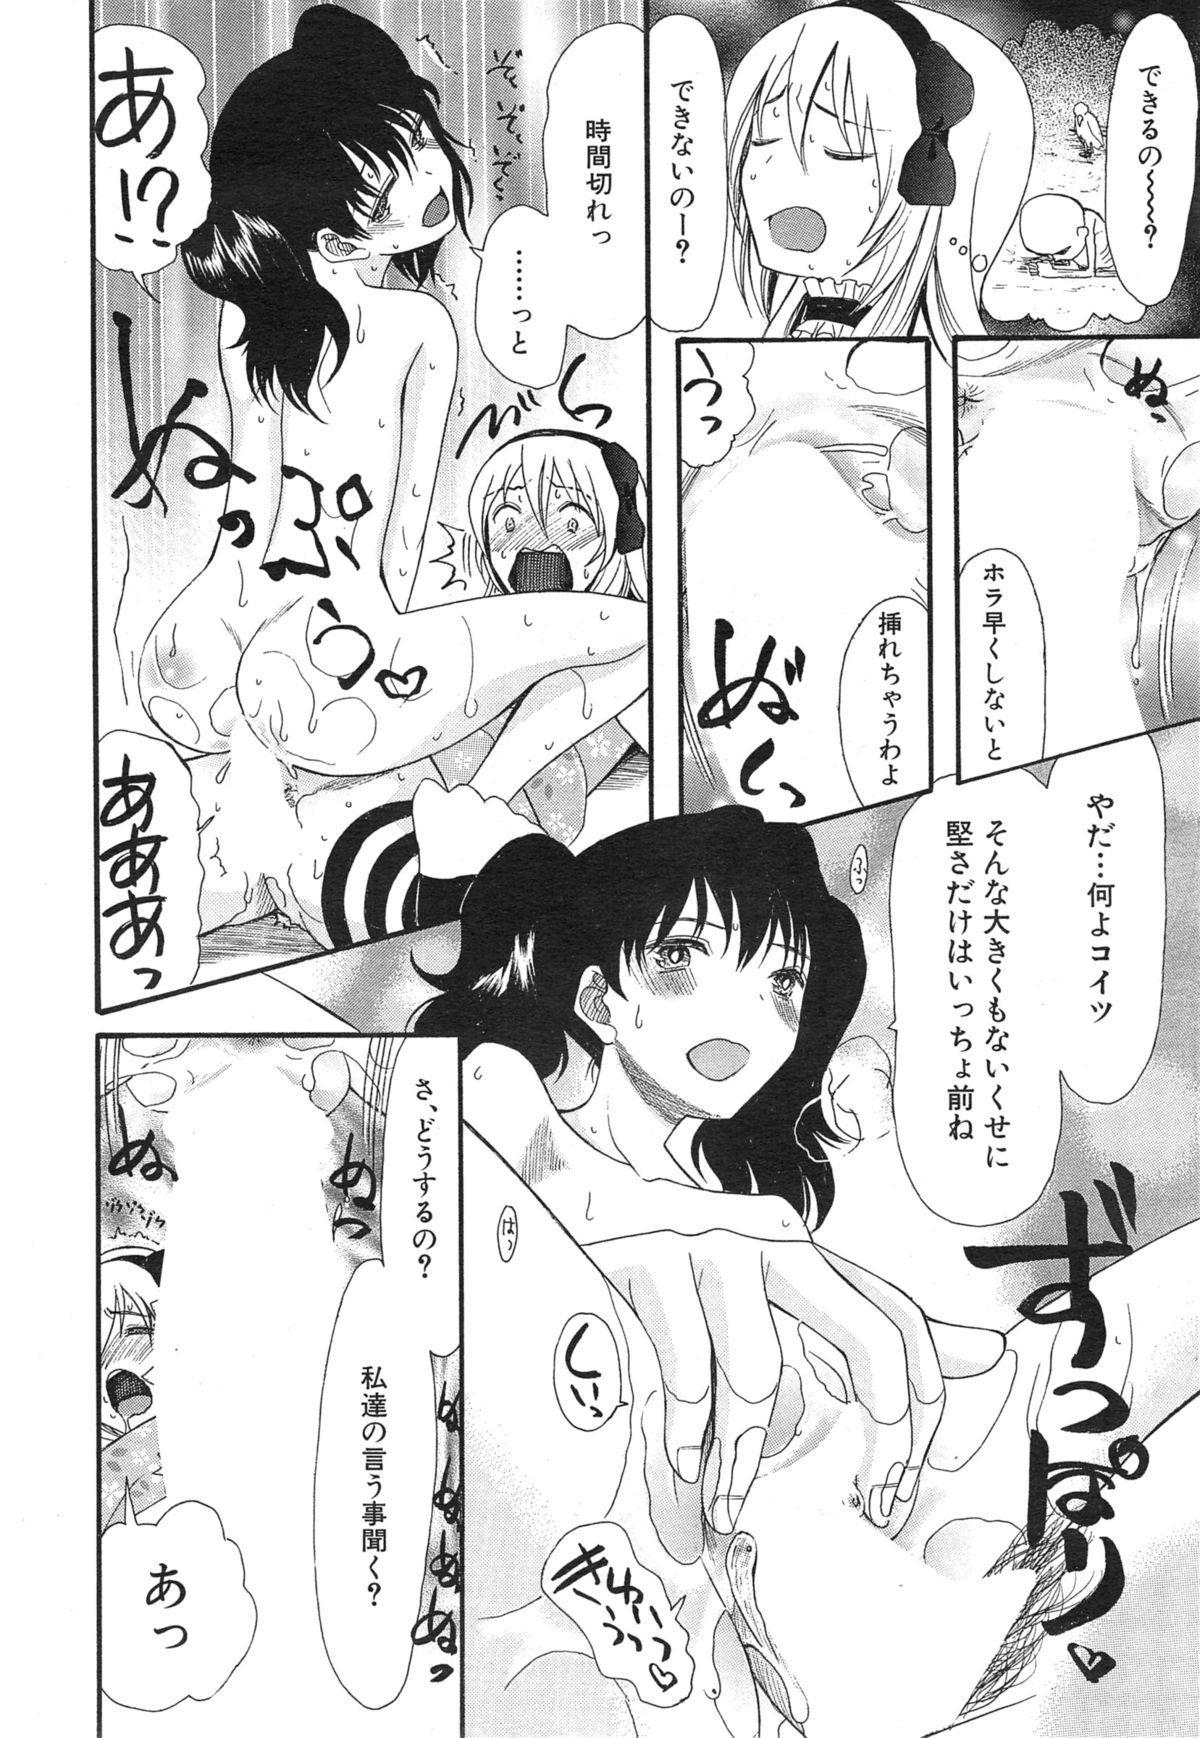 Kawaiku Natte Omocha ni Natte 21